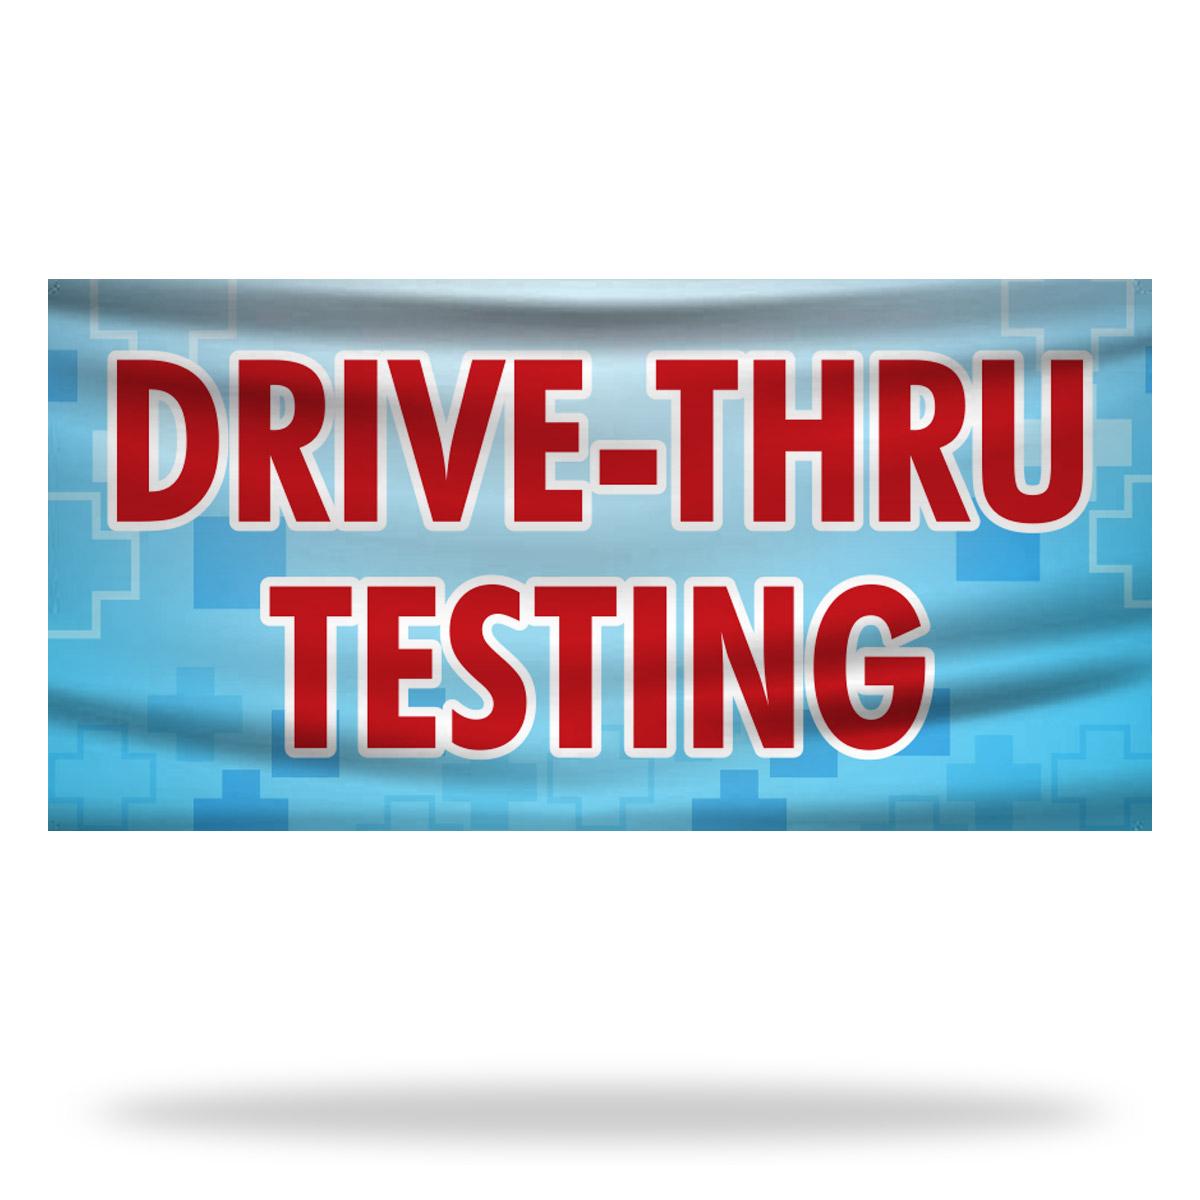 Drive Thru Testing Flags & Banners Design 02